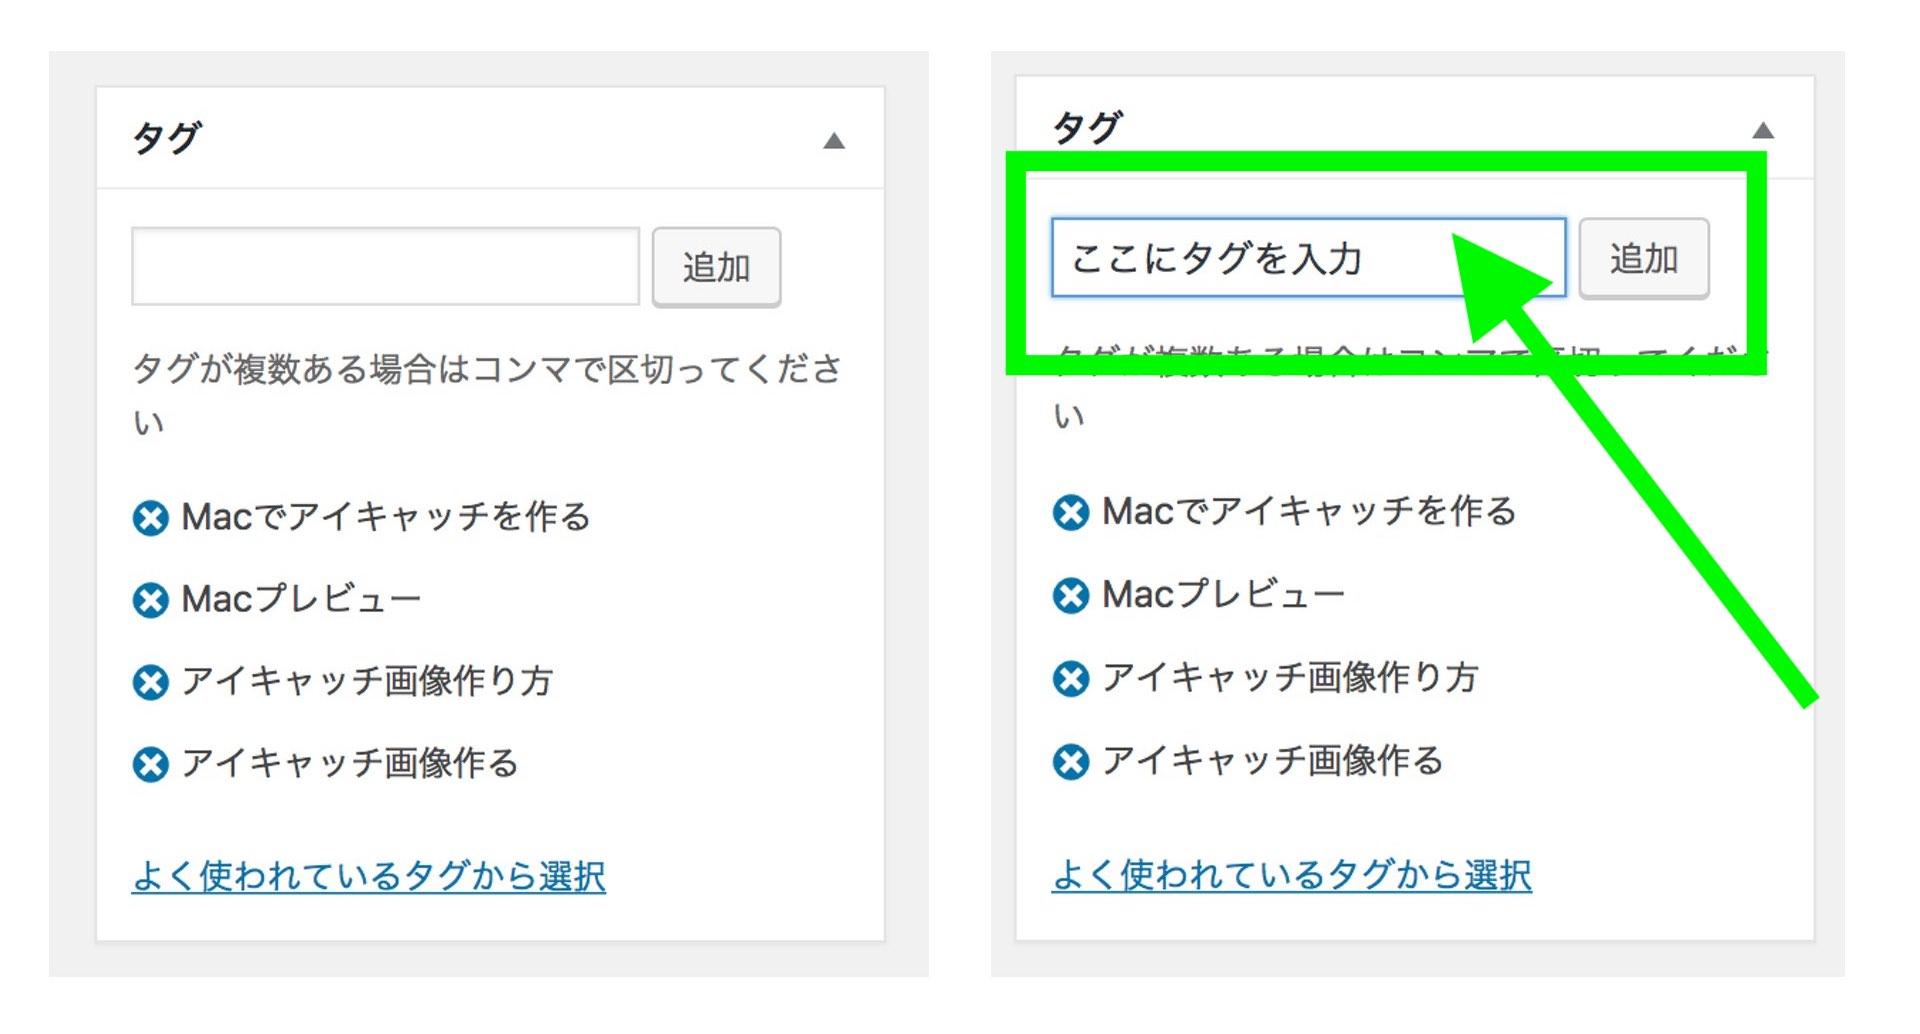 WordPressでタグを入力する欄の画像